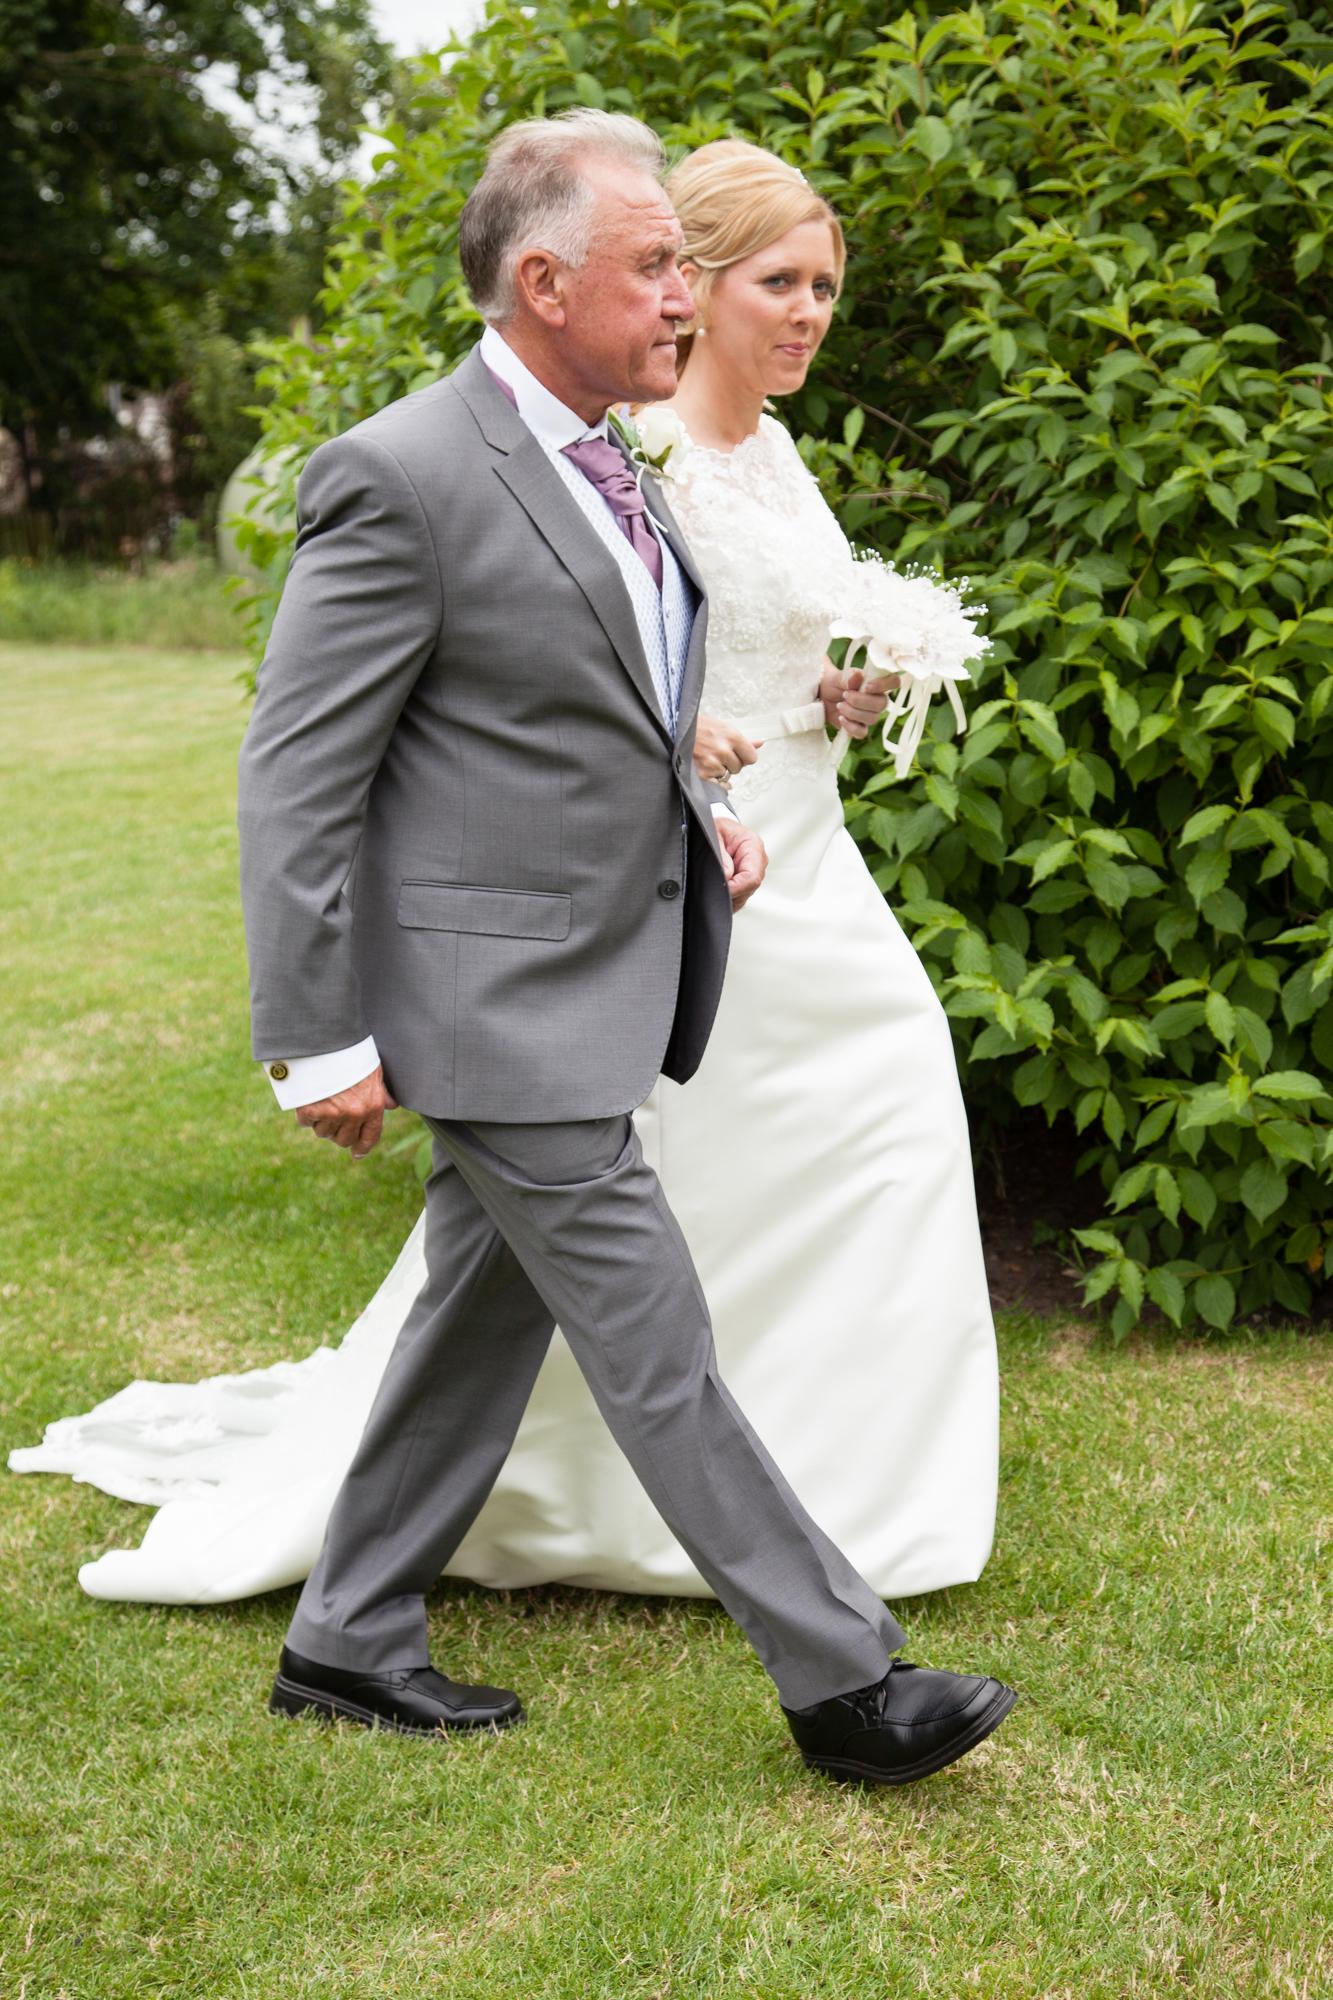 110715_LisaCraigJohnson_Wedding_5599191_WebWM.jpg